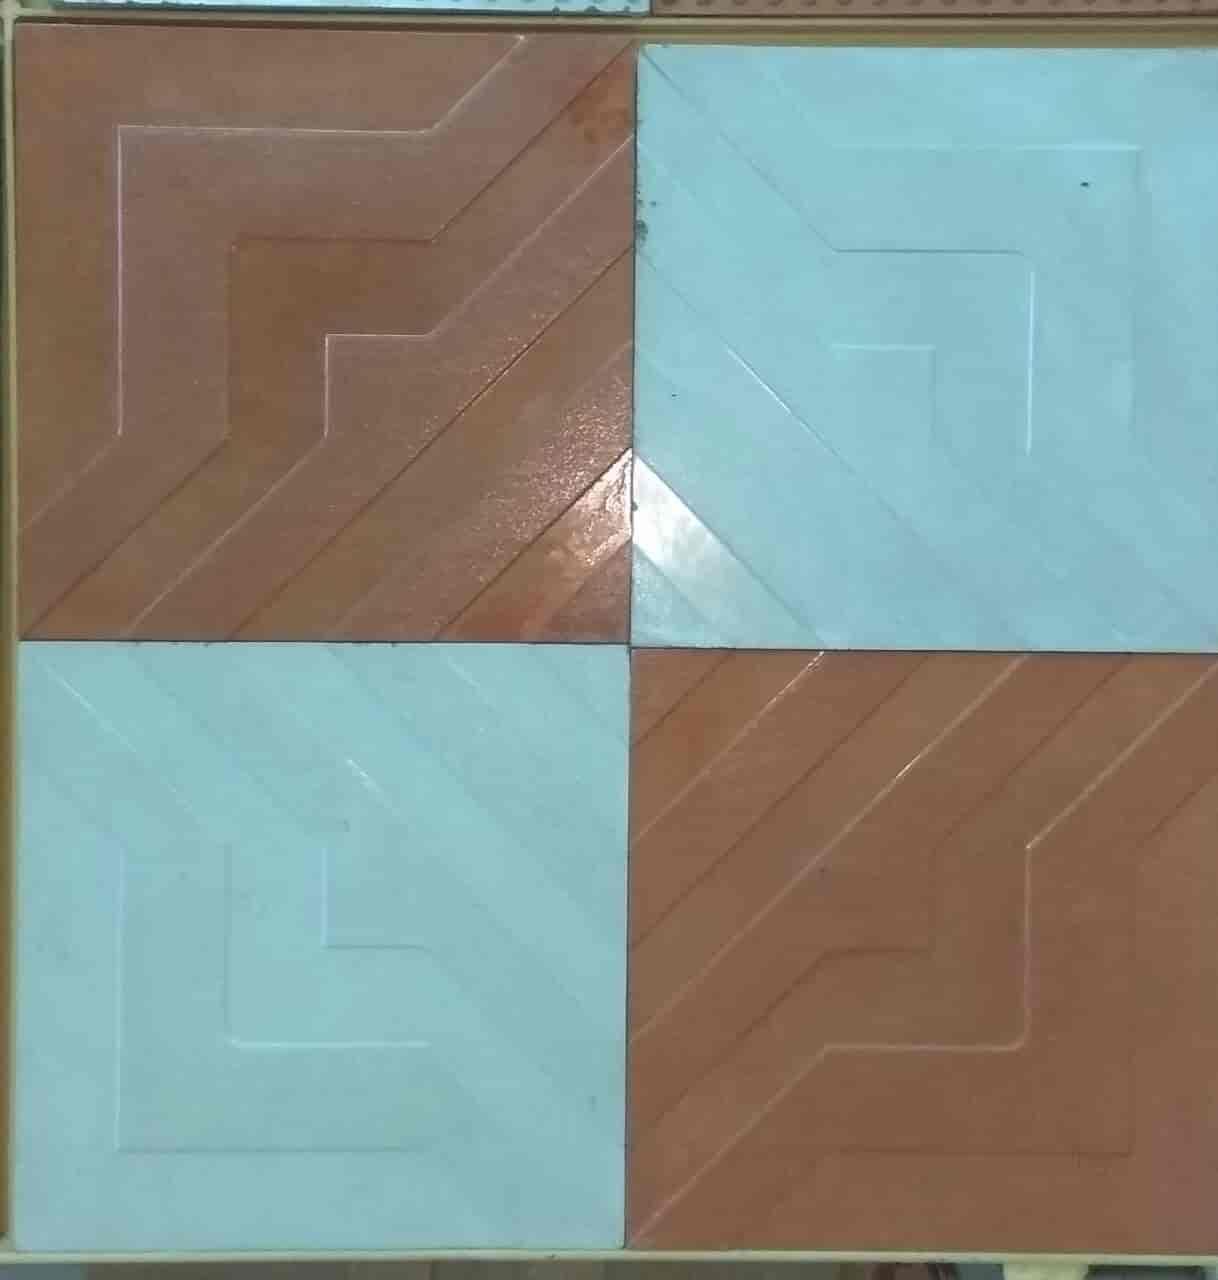 K P Designer Tiles, Perecherla - Tile Manufacturers in Guntur - Justdial